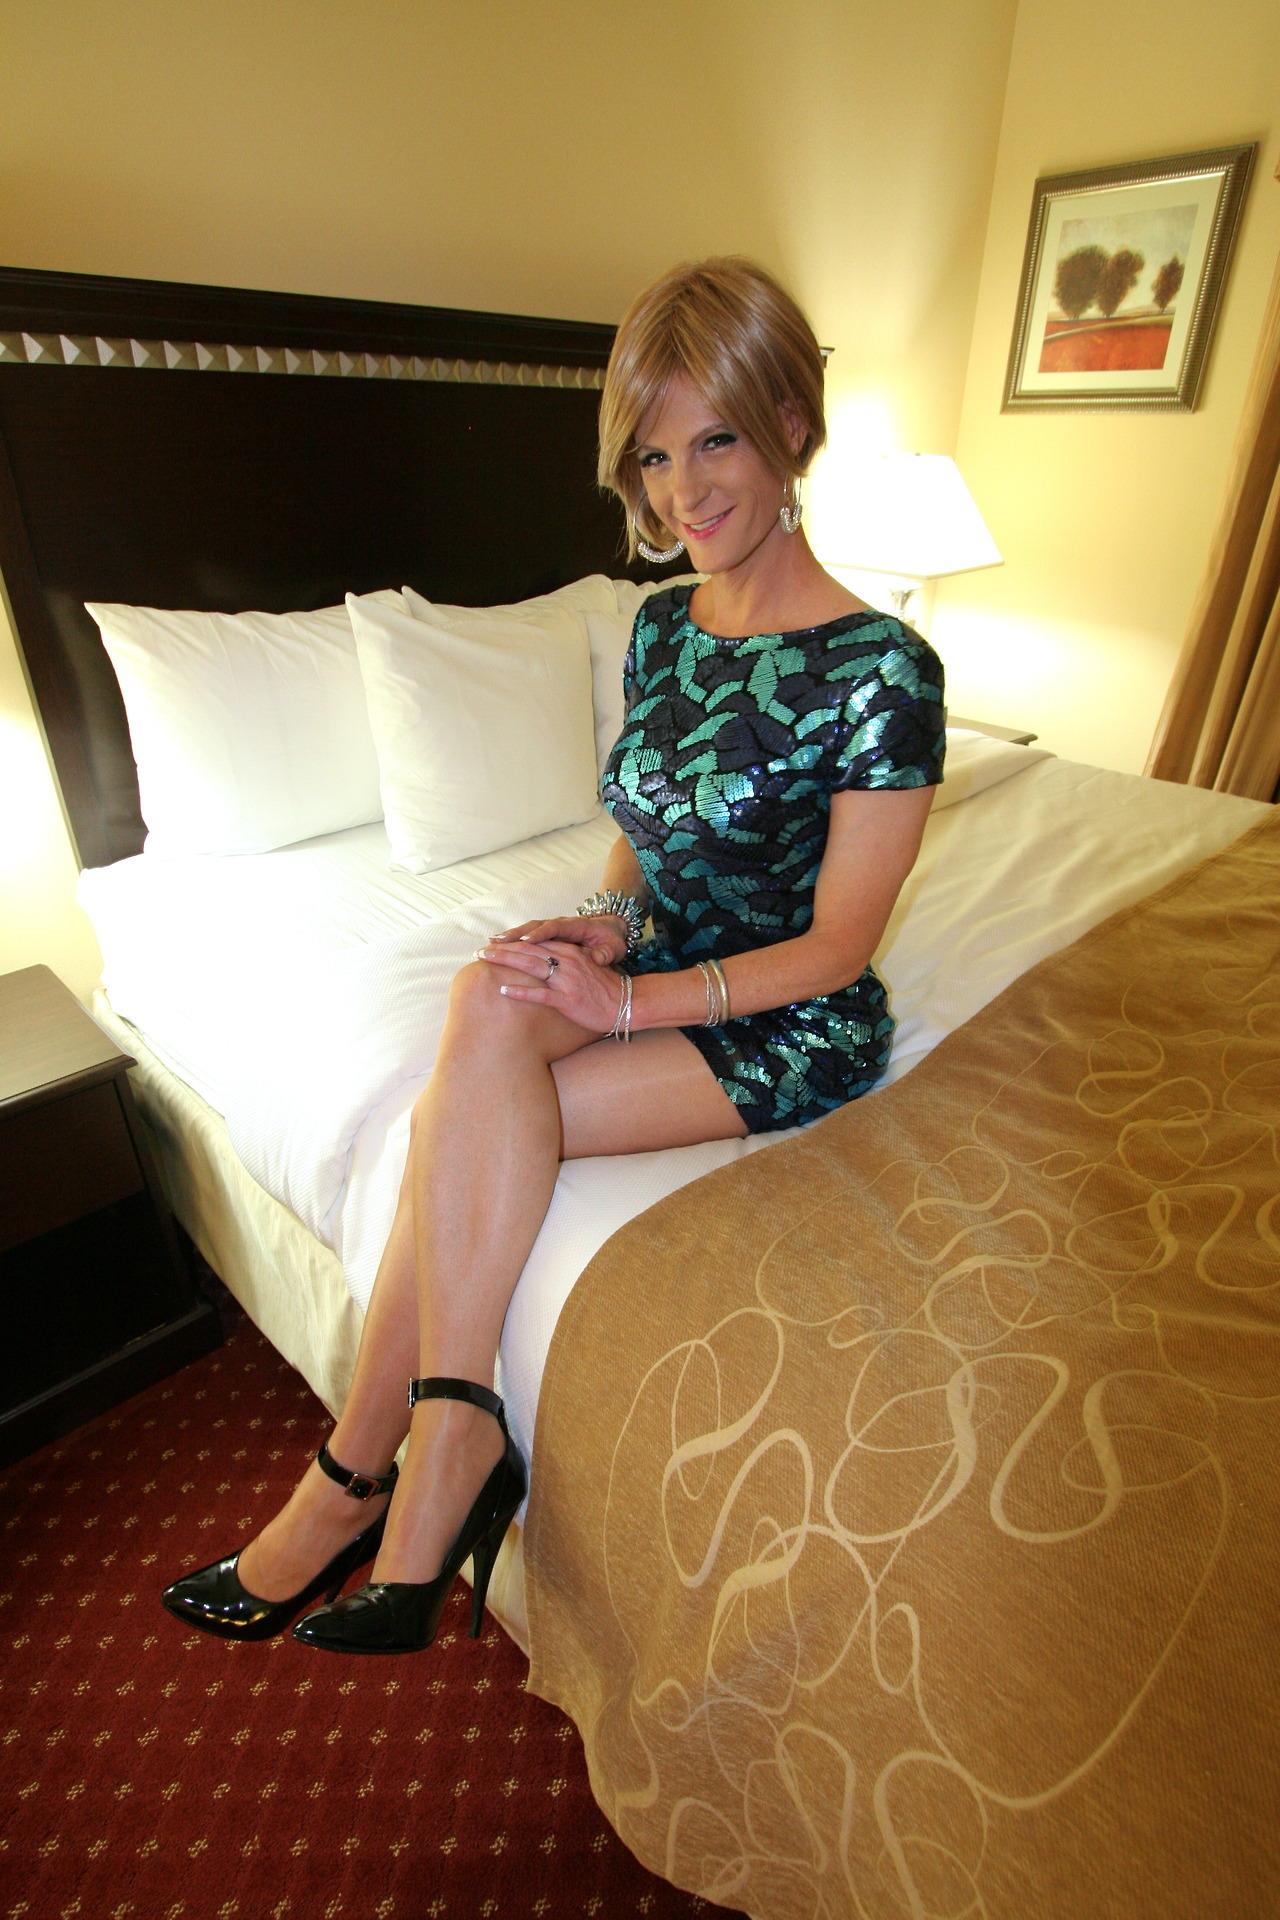 Frilly Sissy Tumblr throughout amazing sissy in sparkly aqua dress   stephanie   pinterest